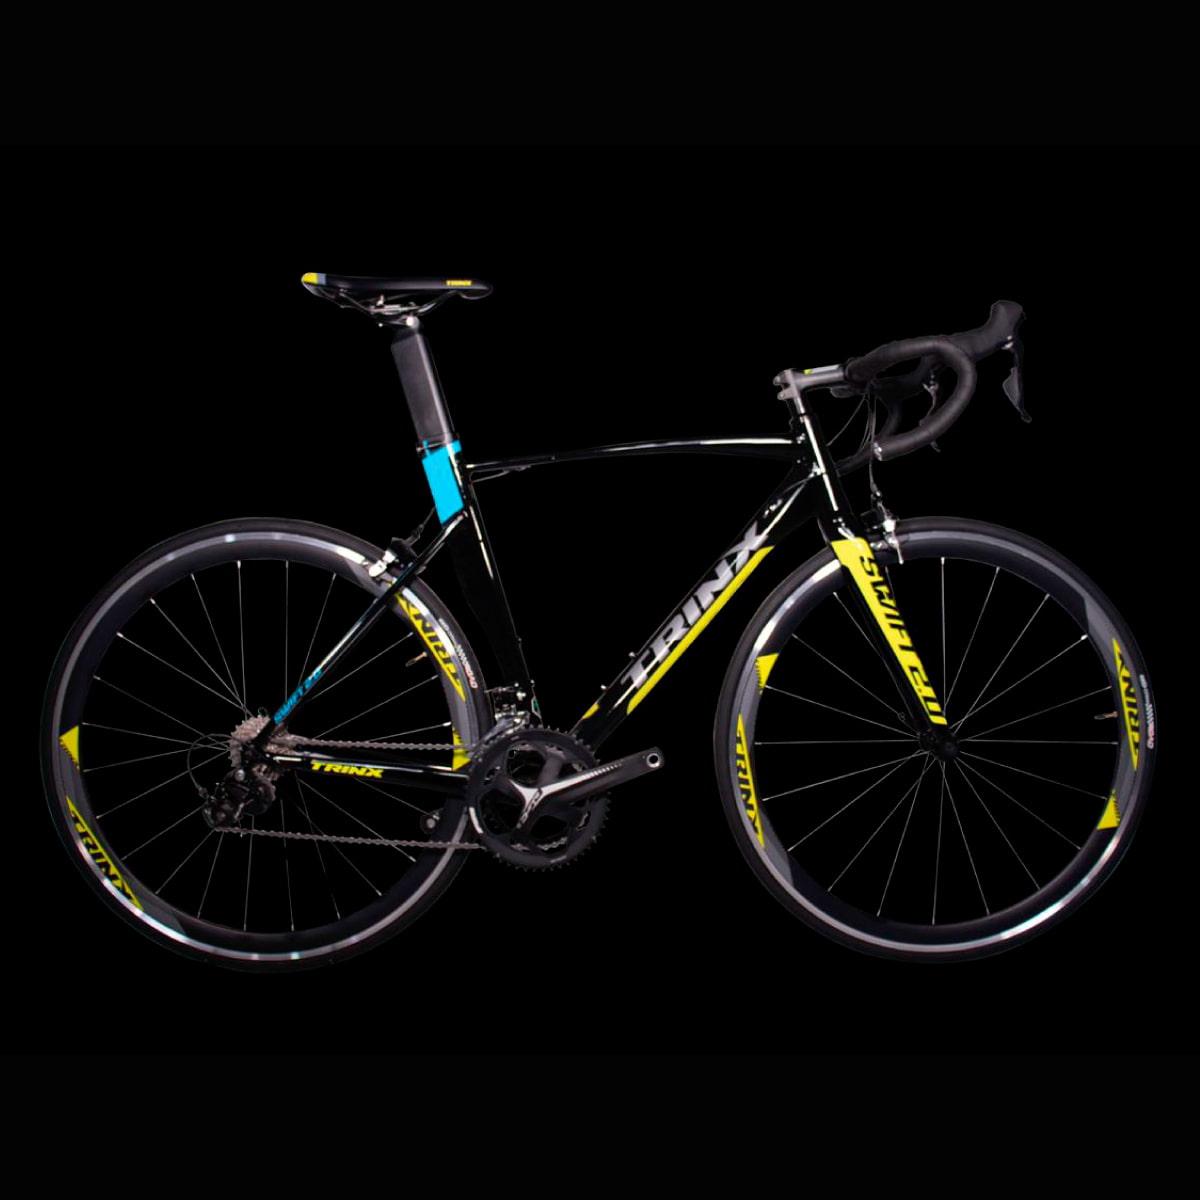 Bike Trinx Swfit 2.0 2020 22v Shimano Preto Amarelo